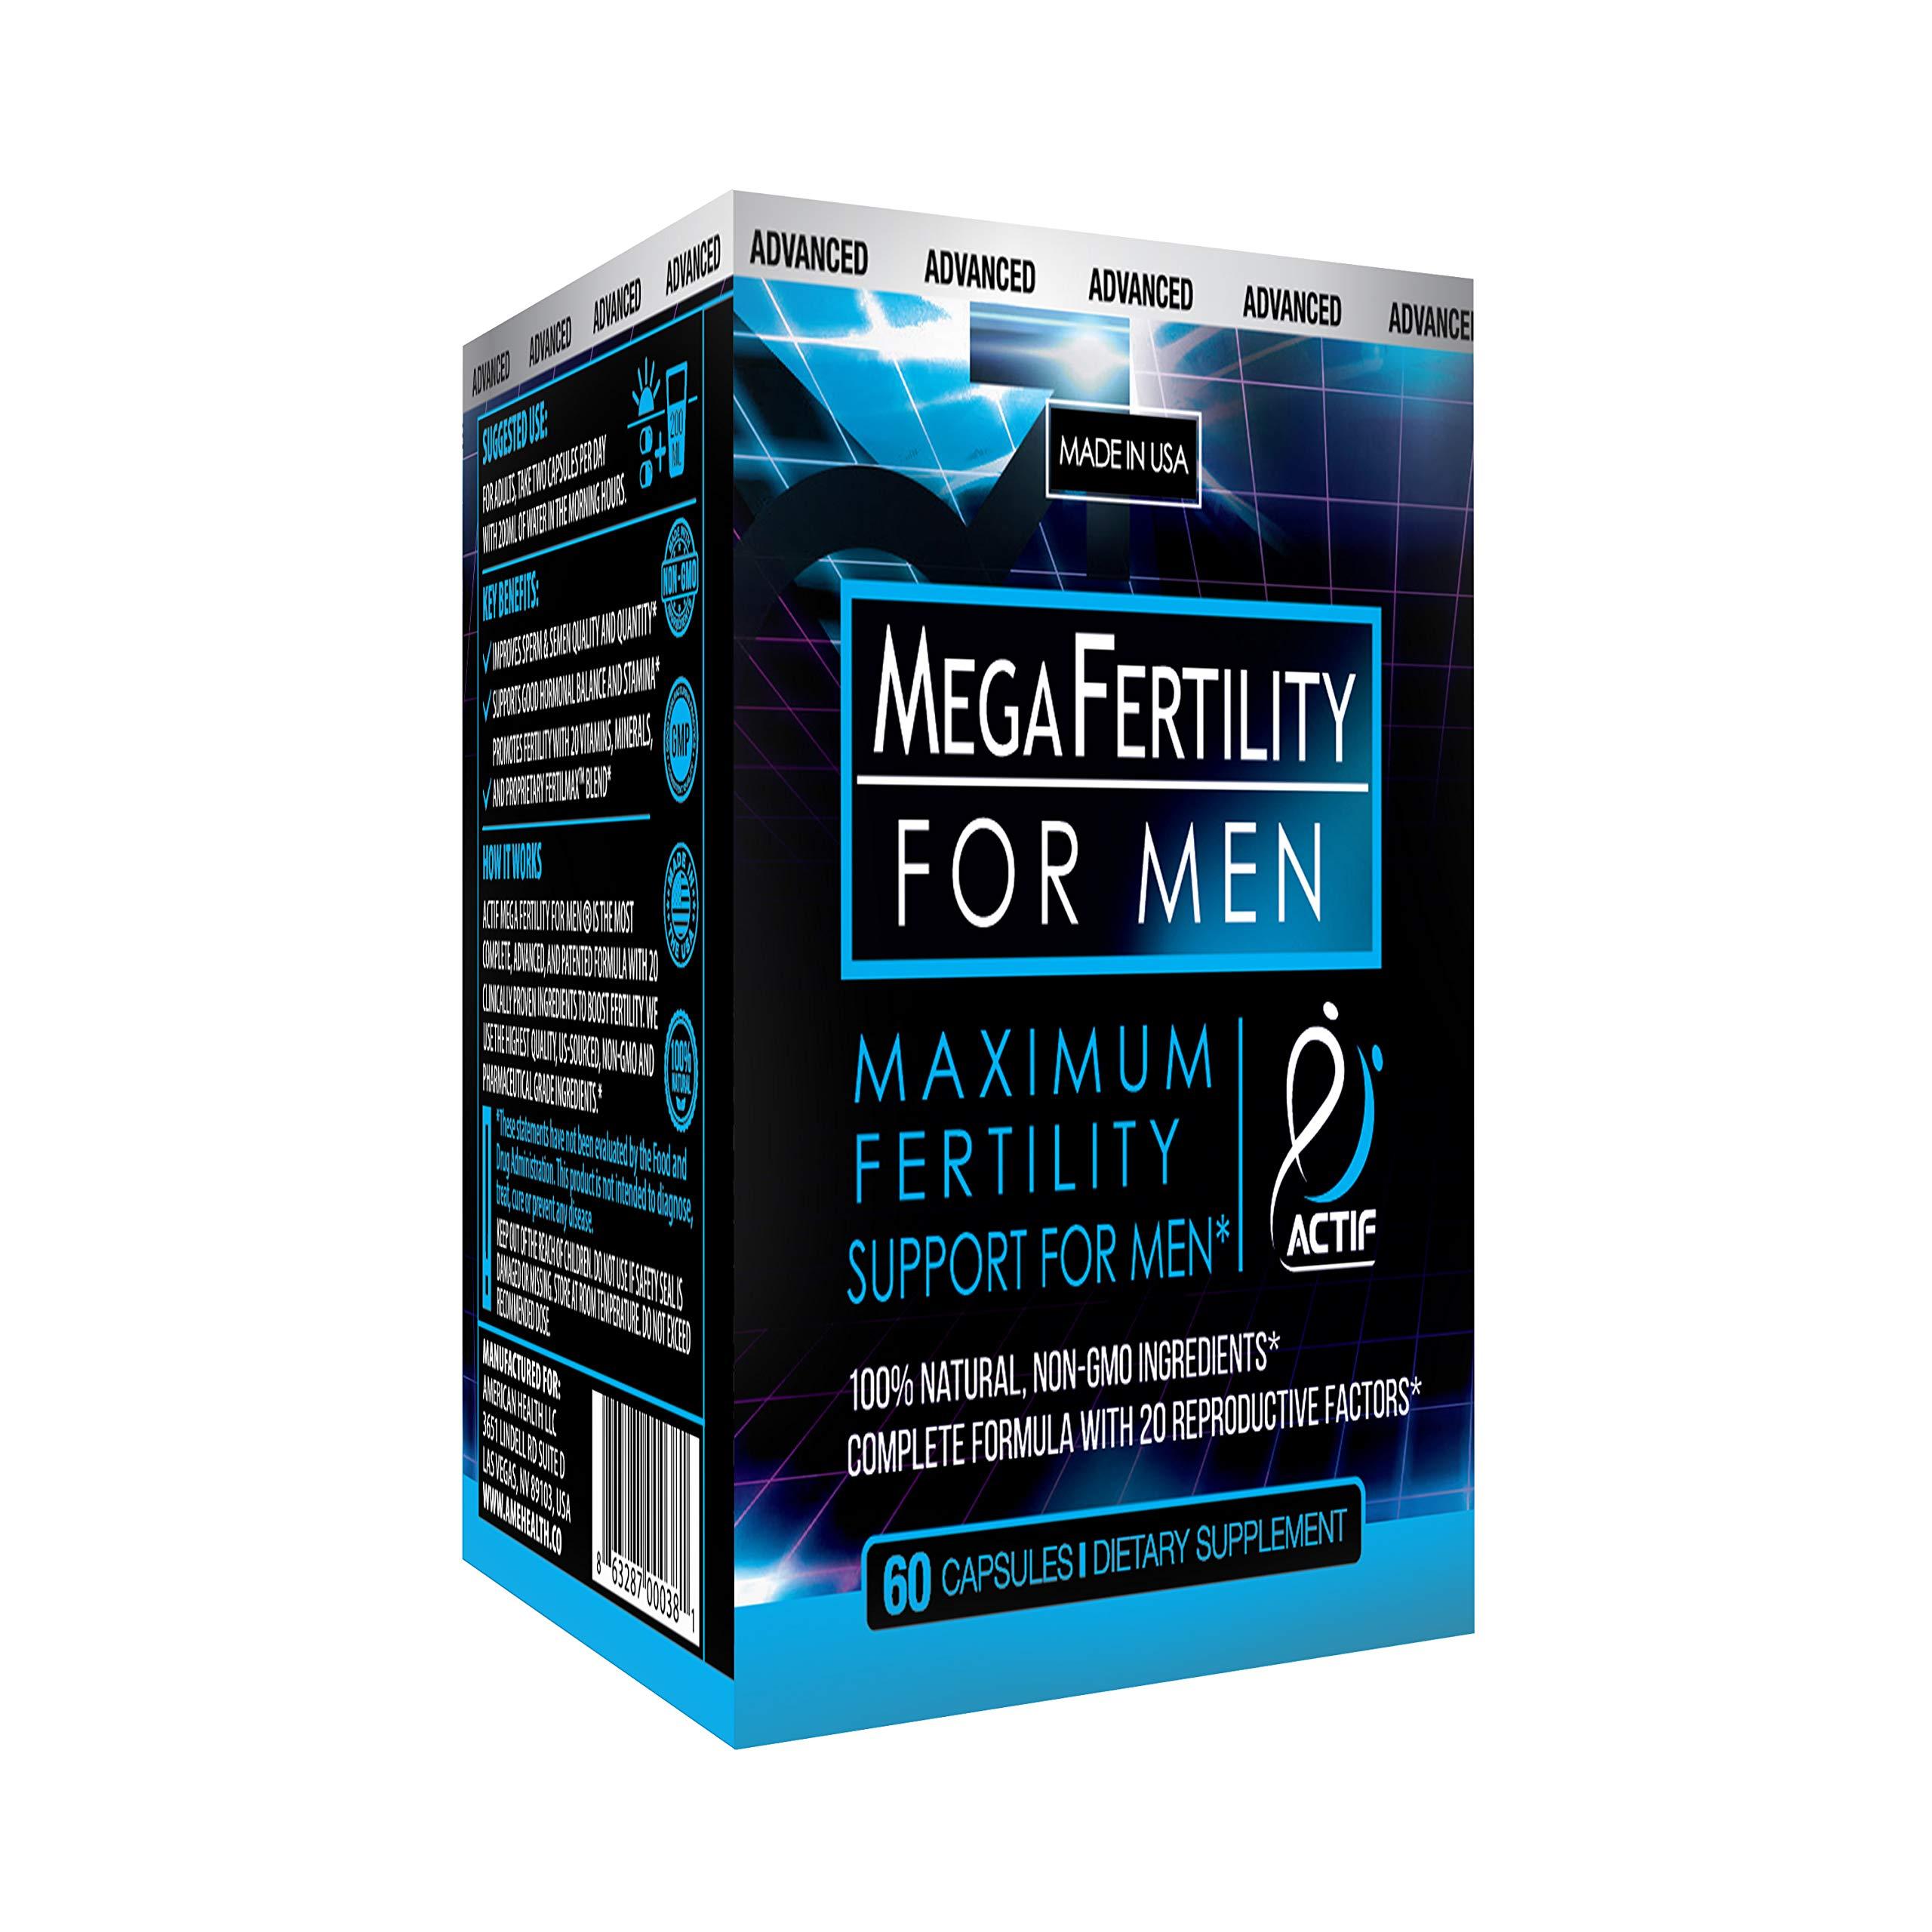 Actif Organic Mega Fertility Fertilmax for Men - Maximum Sperm Support - Non-GMO, Made in USA, 60 Count